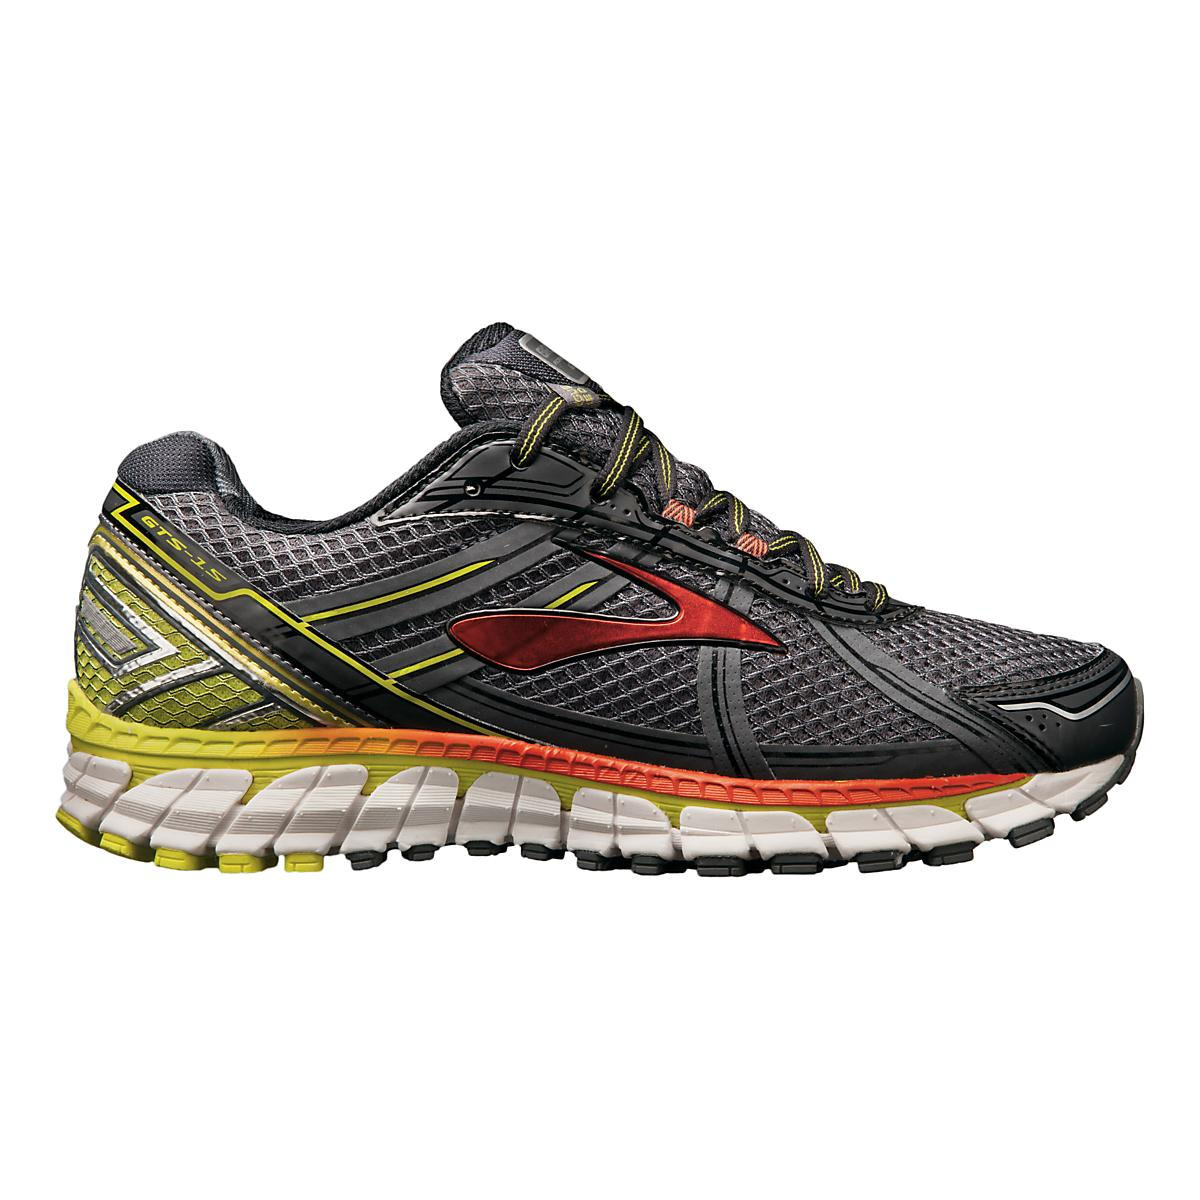 453b6d78a72 Mens Brooks Adrenaline GTS 15 Running Shoe at Road Runner Sports